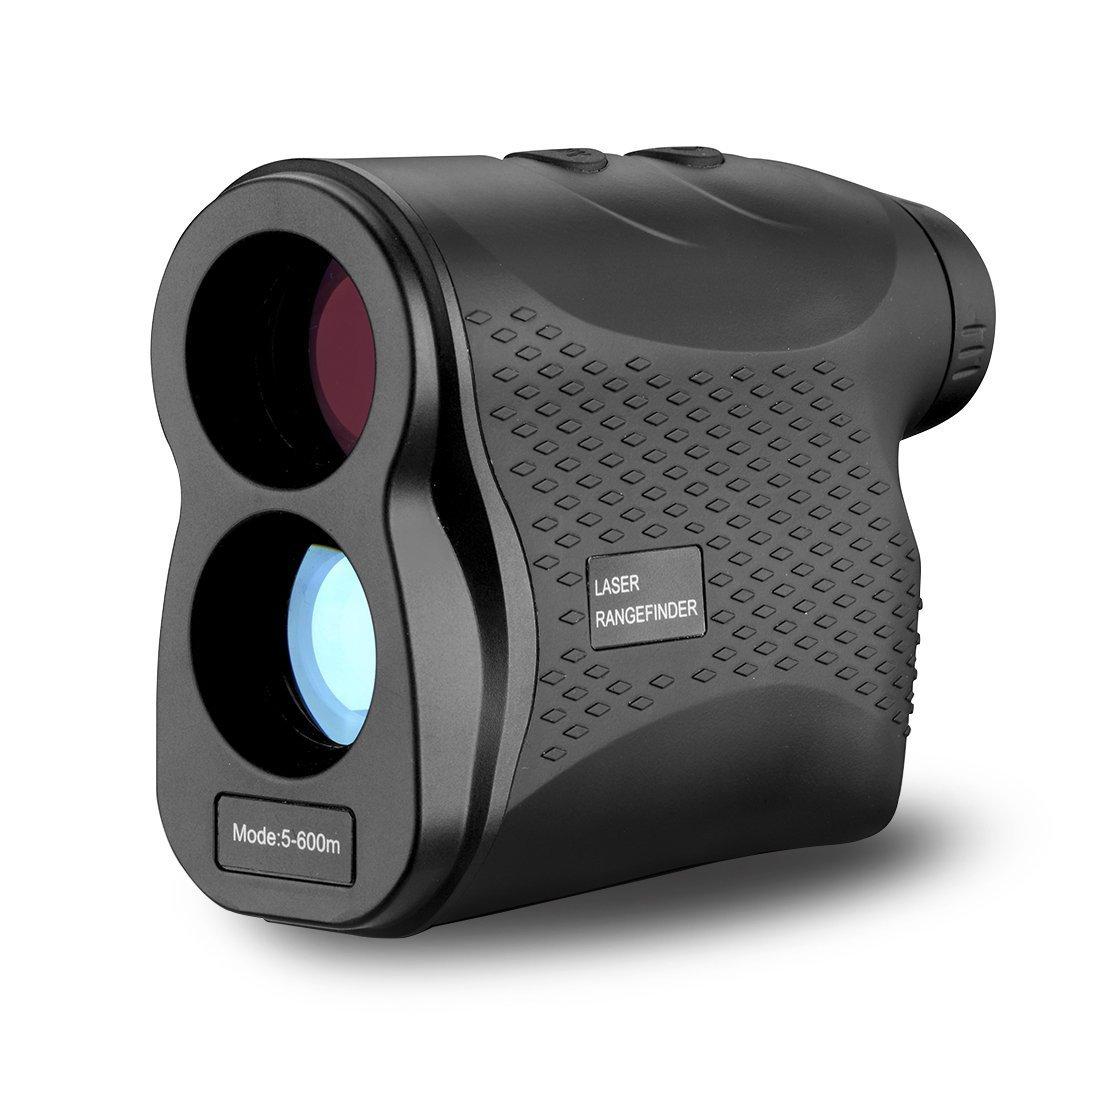 DEKO Golf Rangefinder,Laser Rangefinder with Slope, Fog,Scan,Precision Speed Measurement,6X Magnification,Carrying Bag(656yard/600m) by DEKO